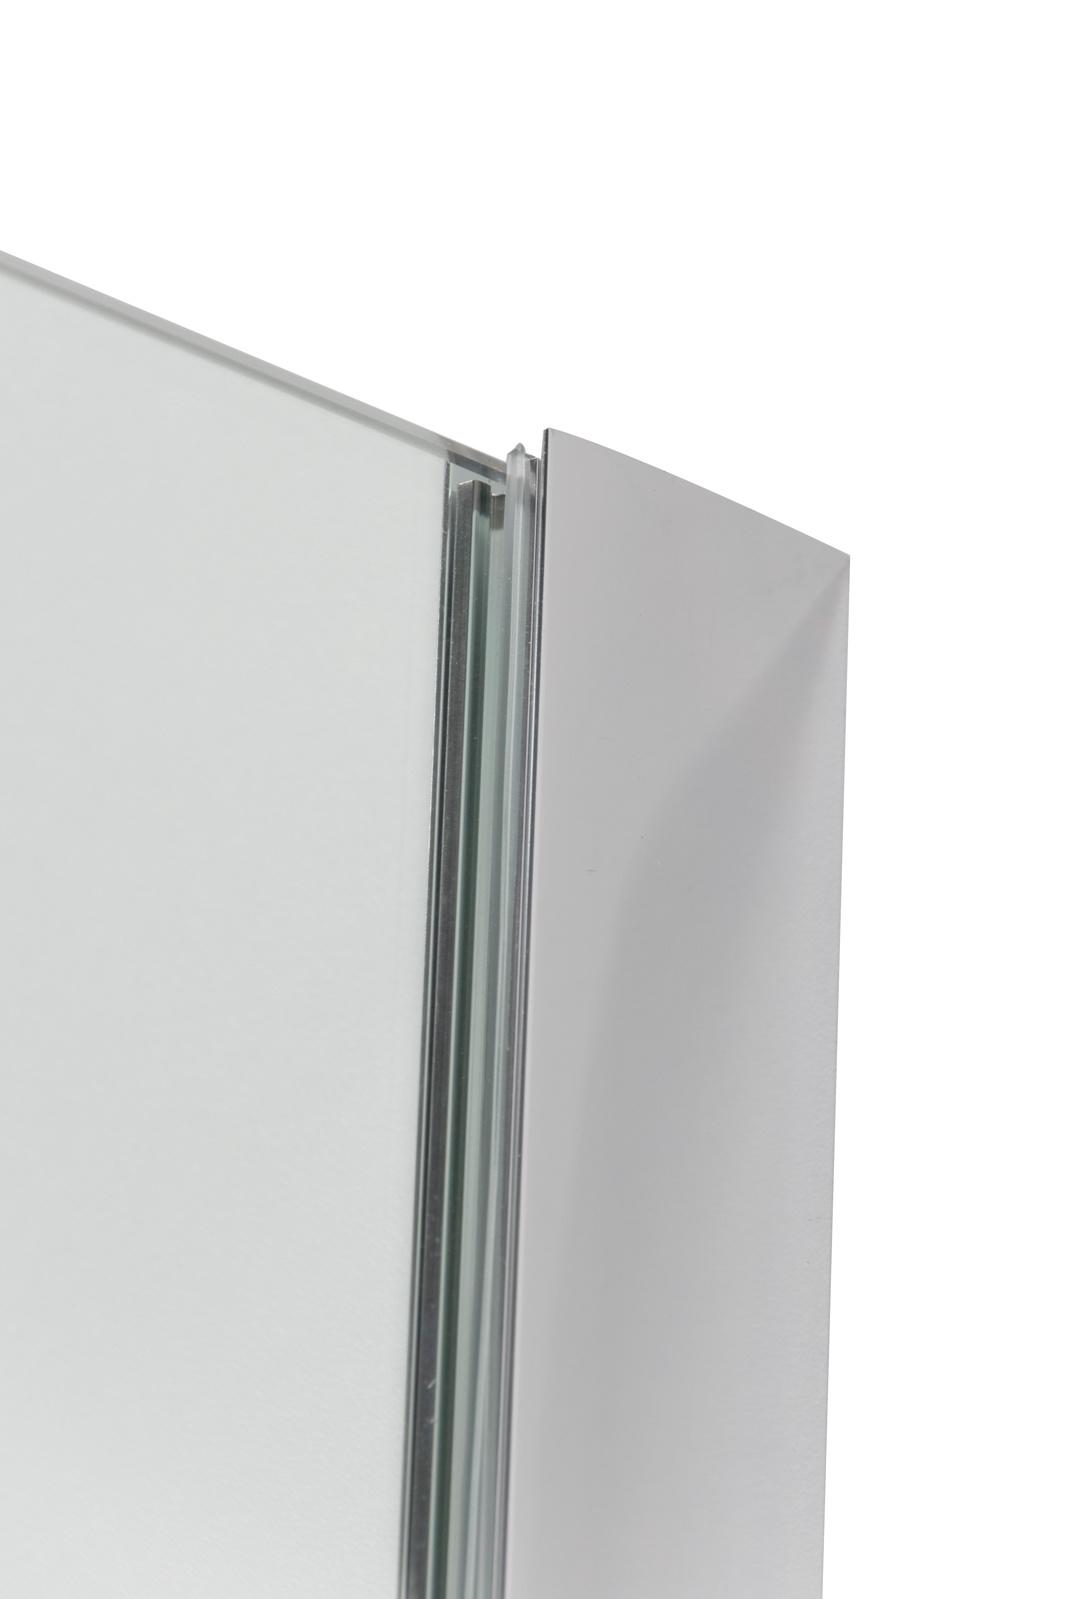 Linea Uno Set Göteborg  Nano 110 x 200 cm + Zijwand Tulta Nano 35 x 200 cm